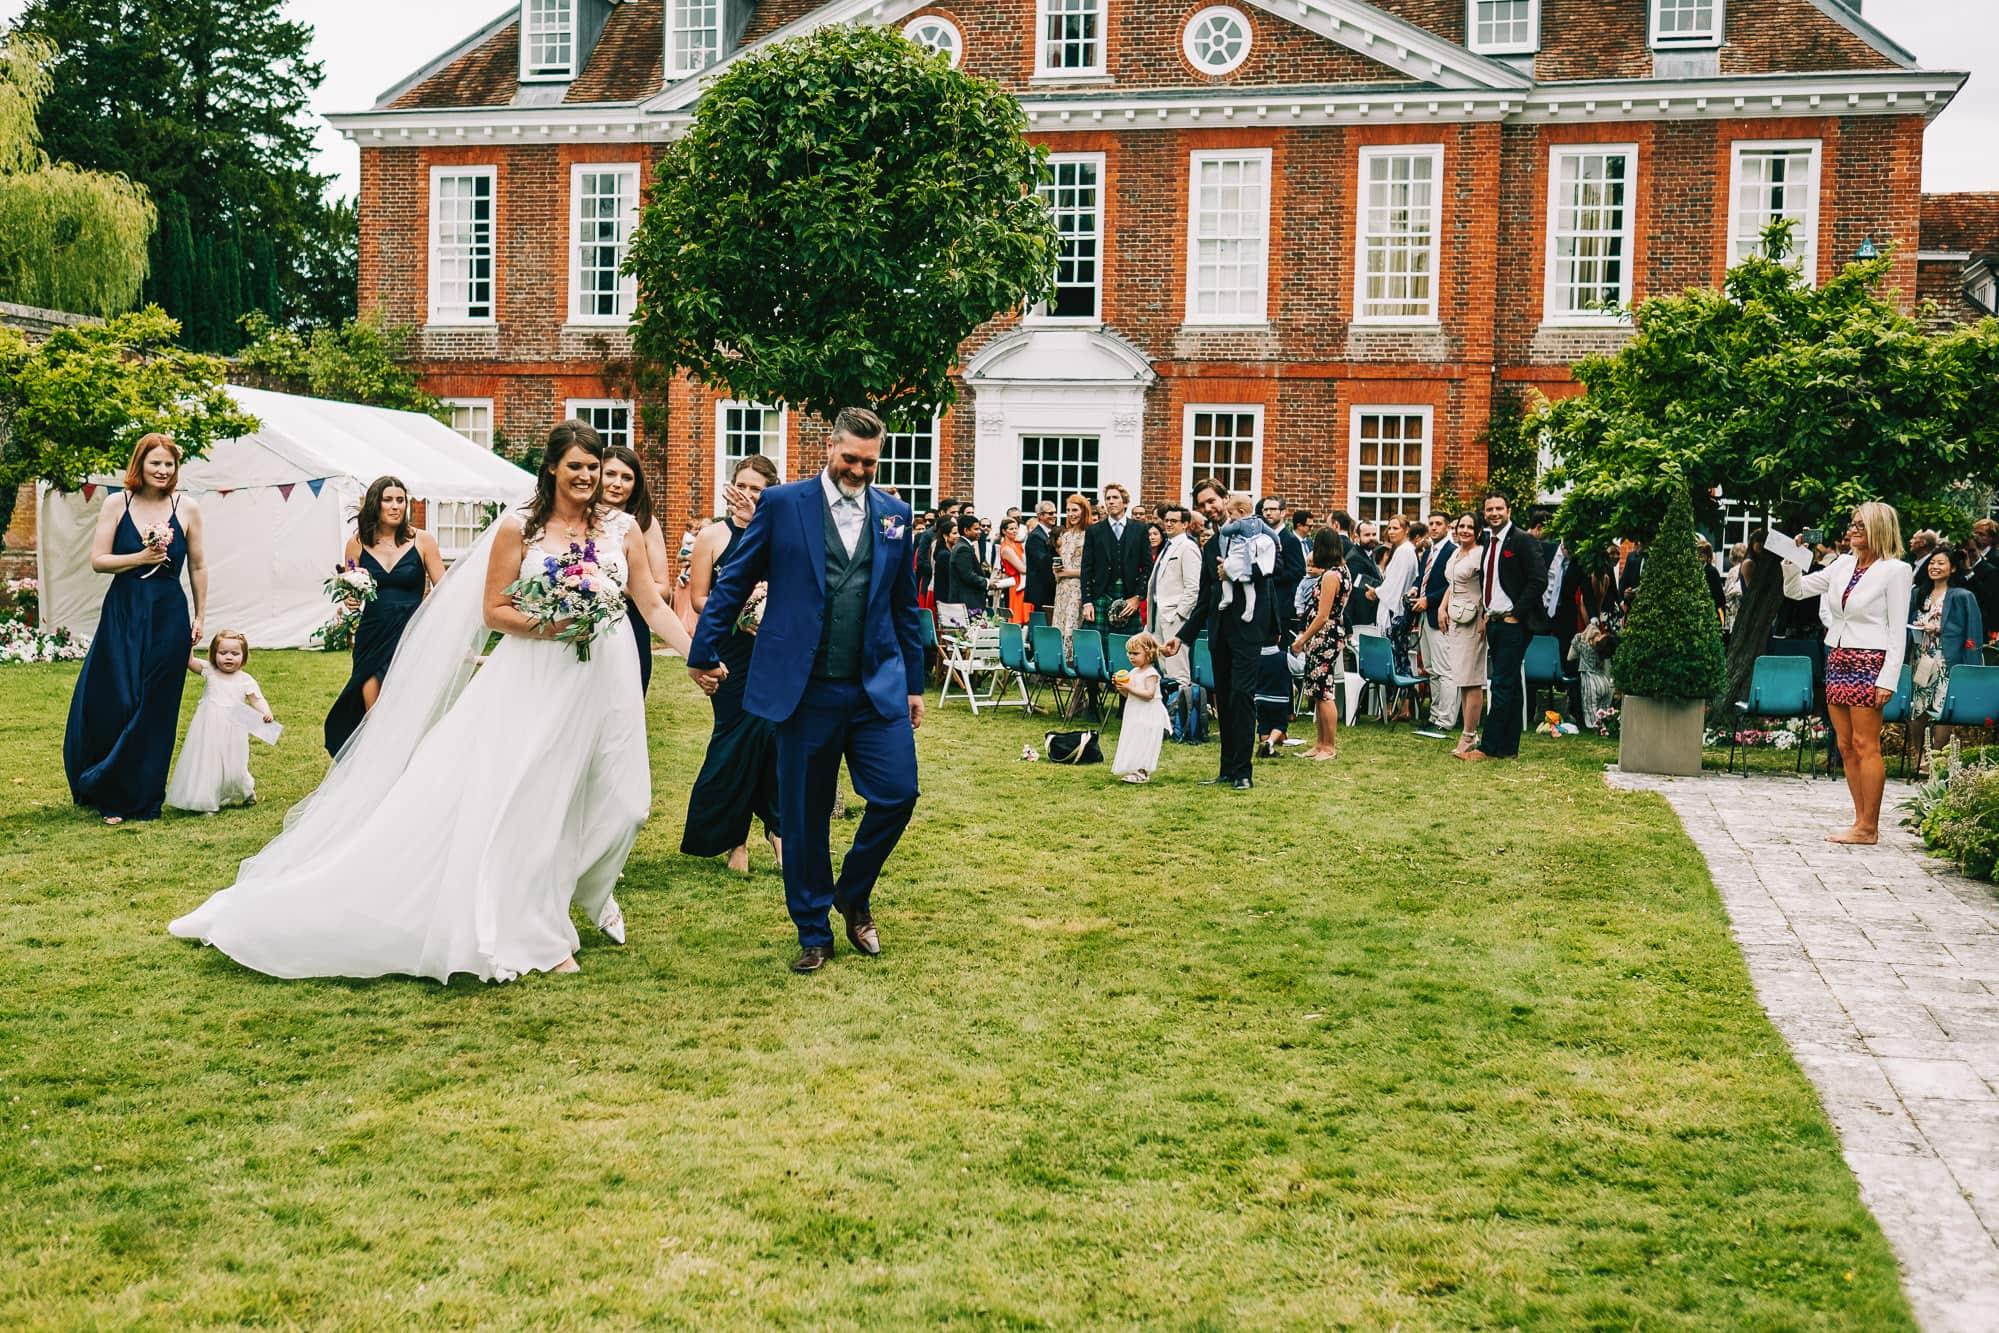 Canterbury Wedding Photographer - Groom doing up his tie